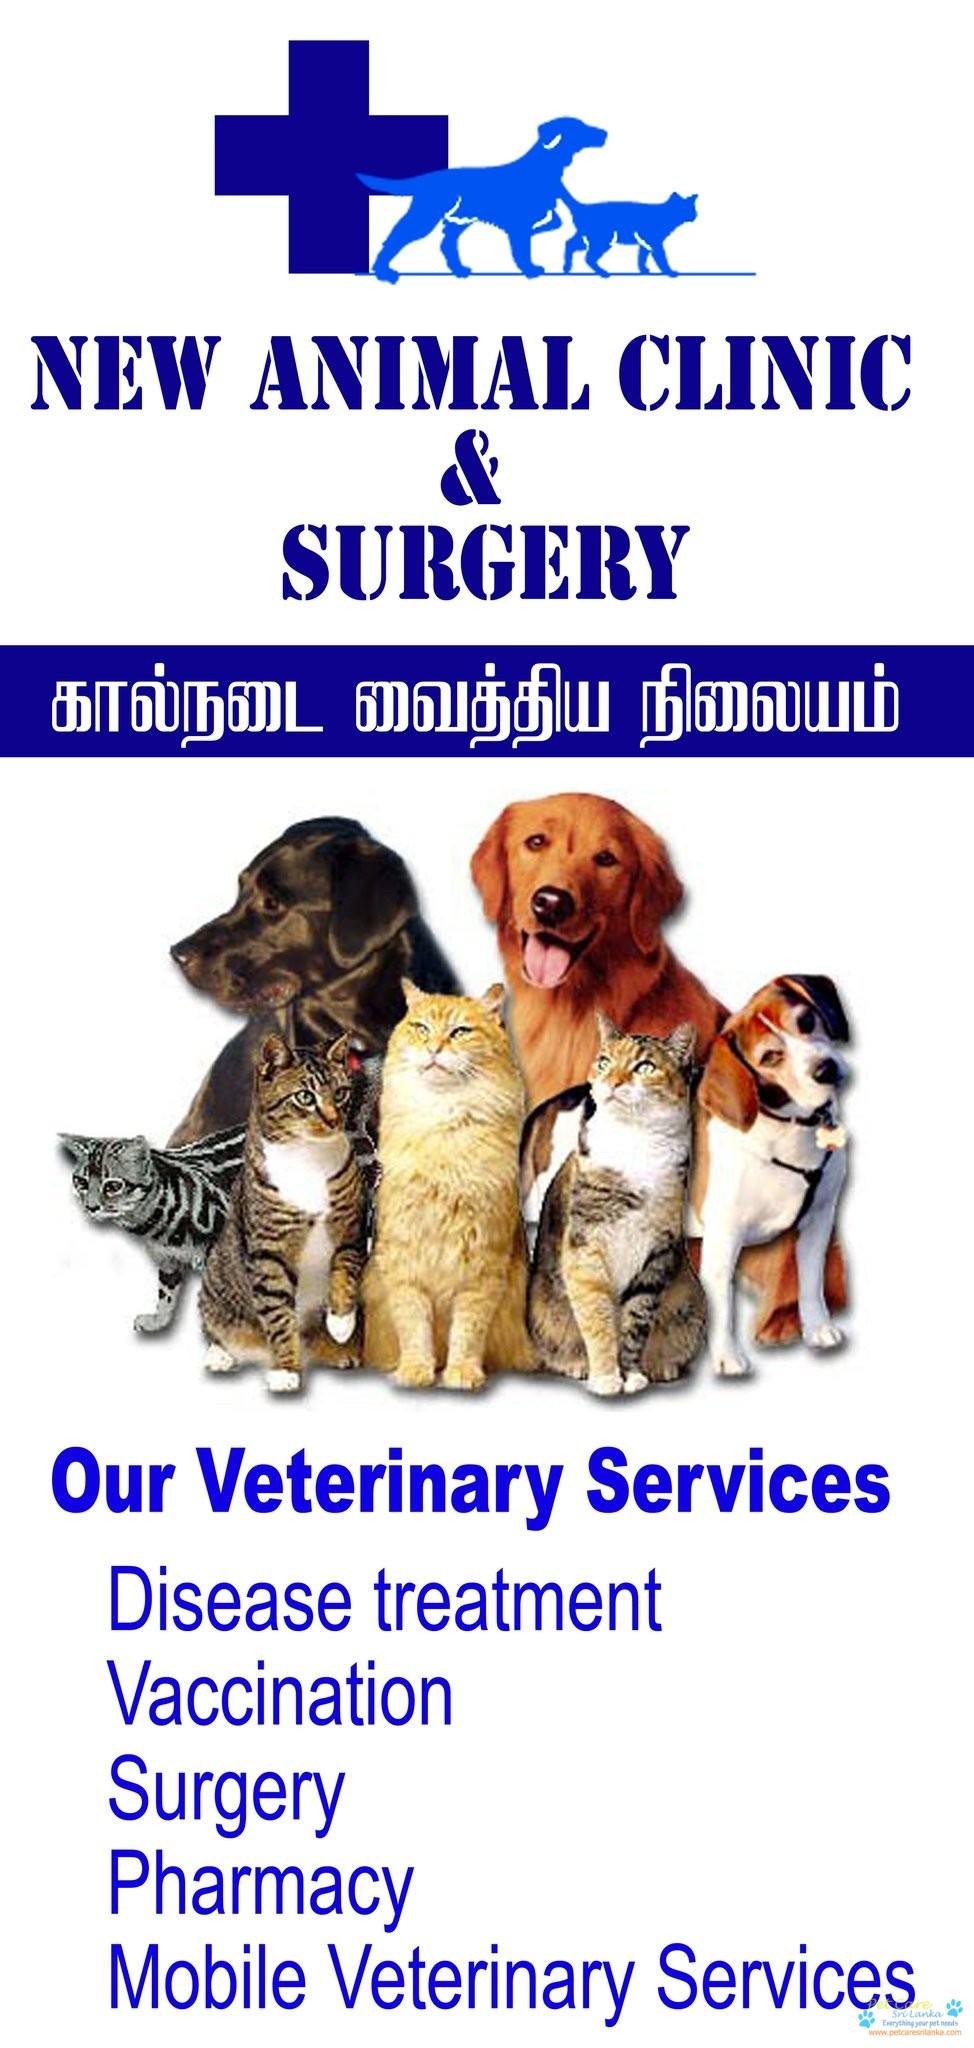 New Animal clinic and Surgery Veterinary Hospital5.jpg